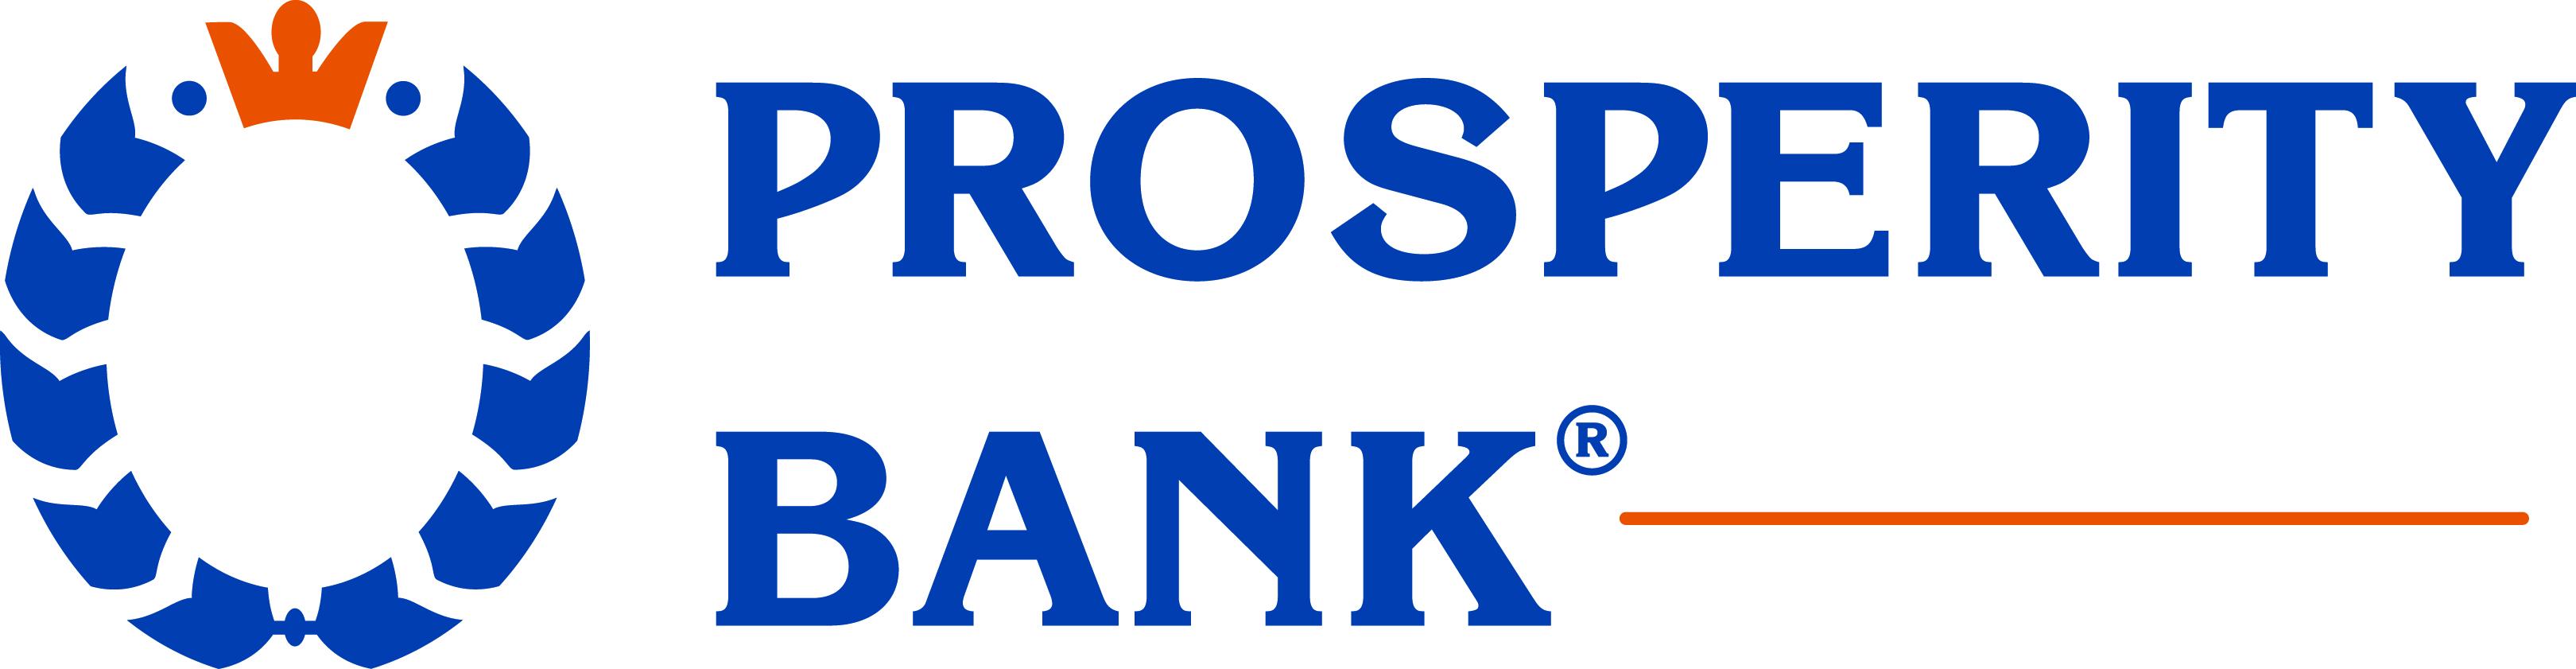 Prosperity Bank logo